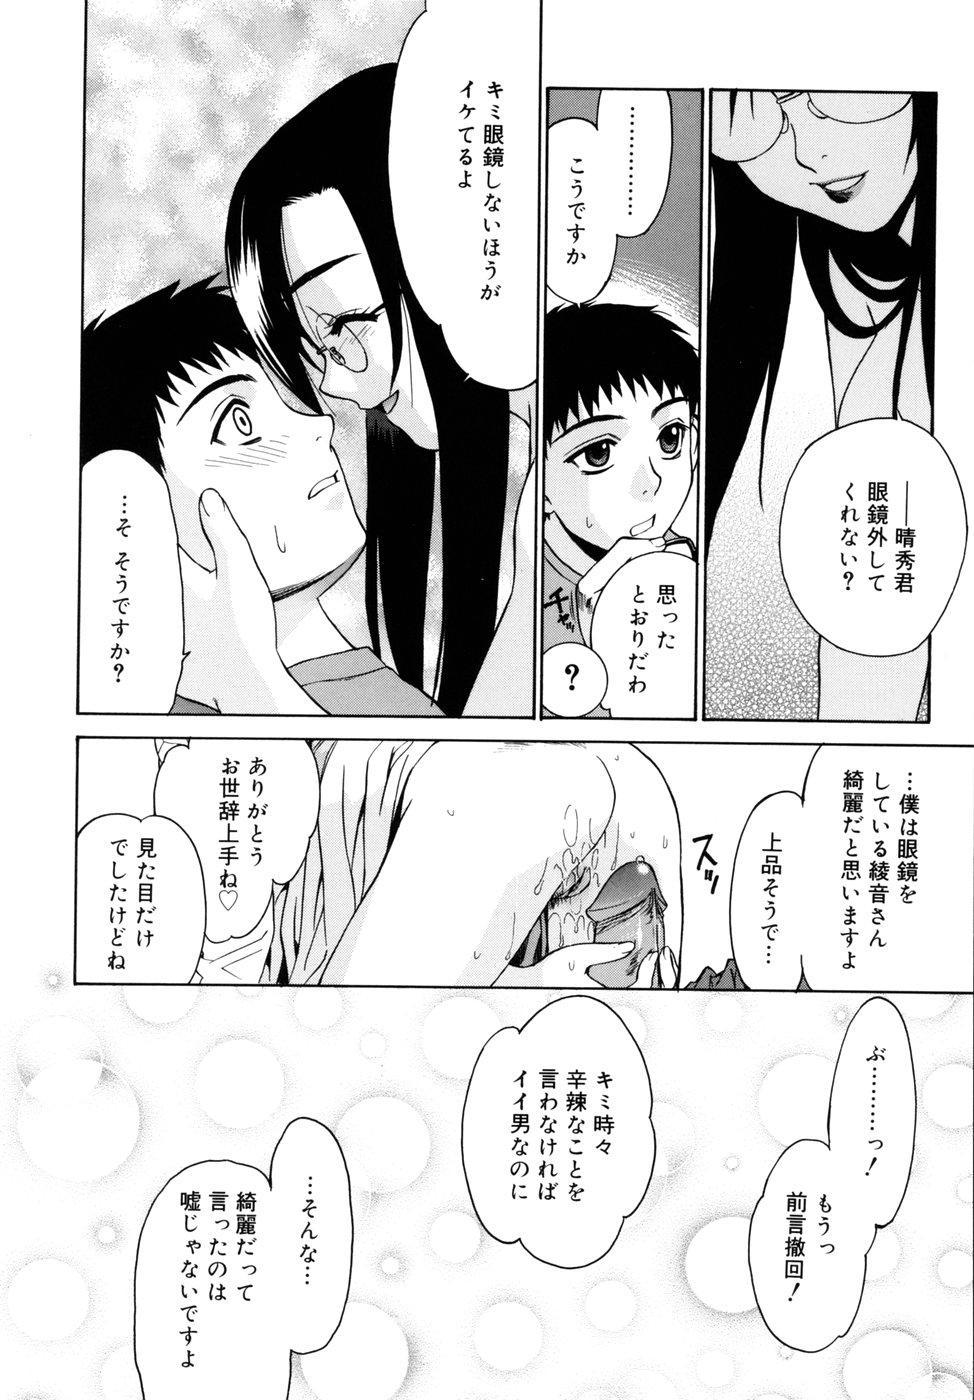 [Yaya Hinata] Tonari no Miko-san wa Minna Warau - The next shrine maidens smile in everyone. 31